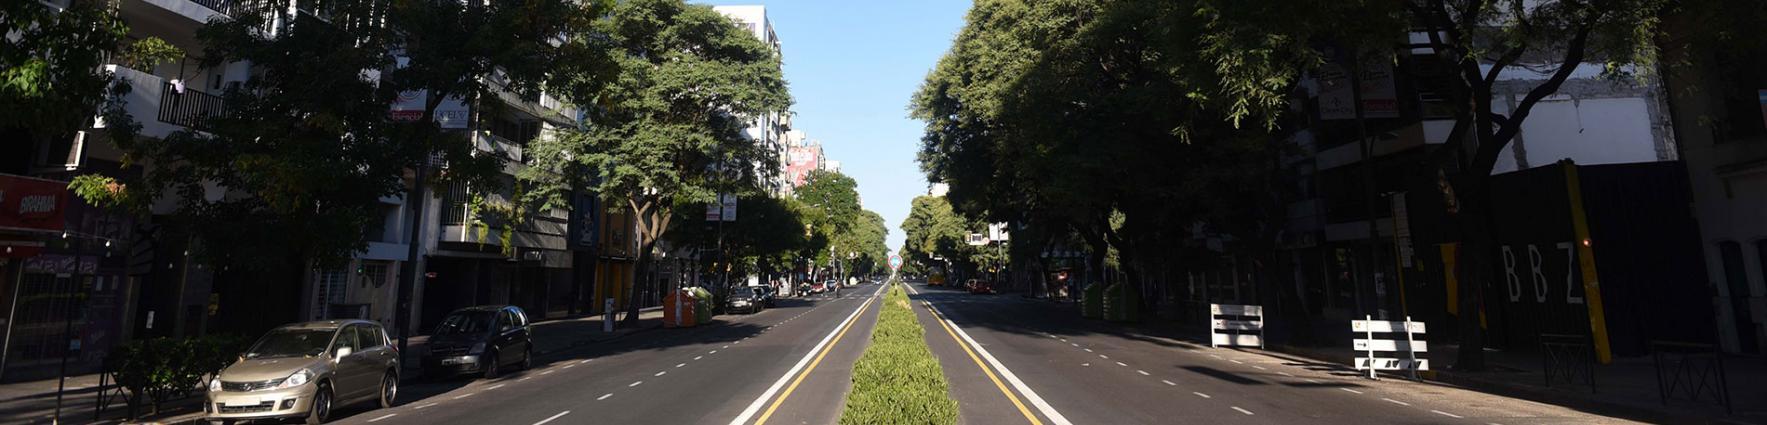 Avenida Pellegrini en aislamiento